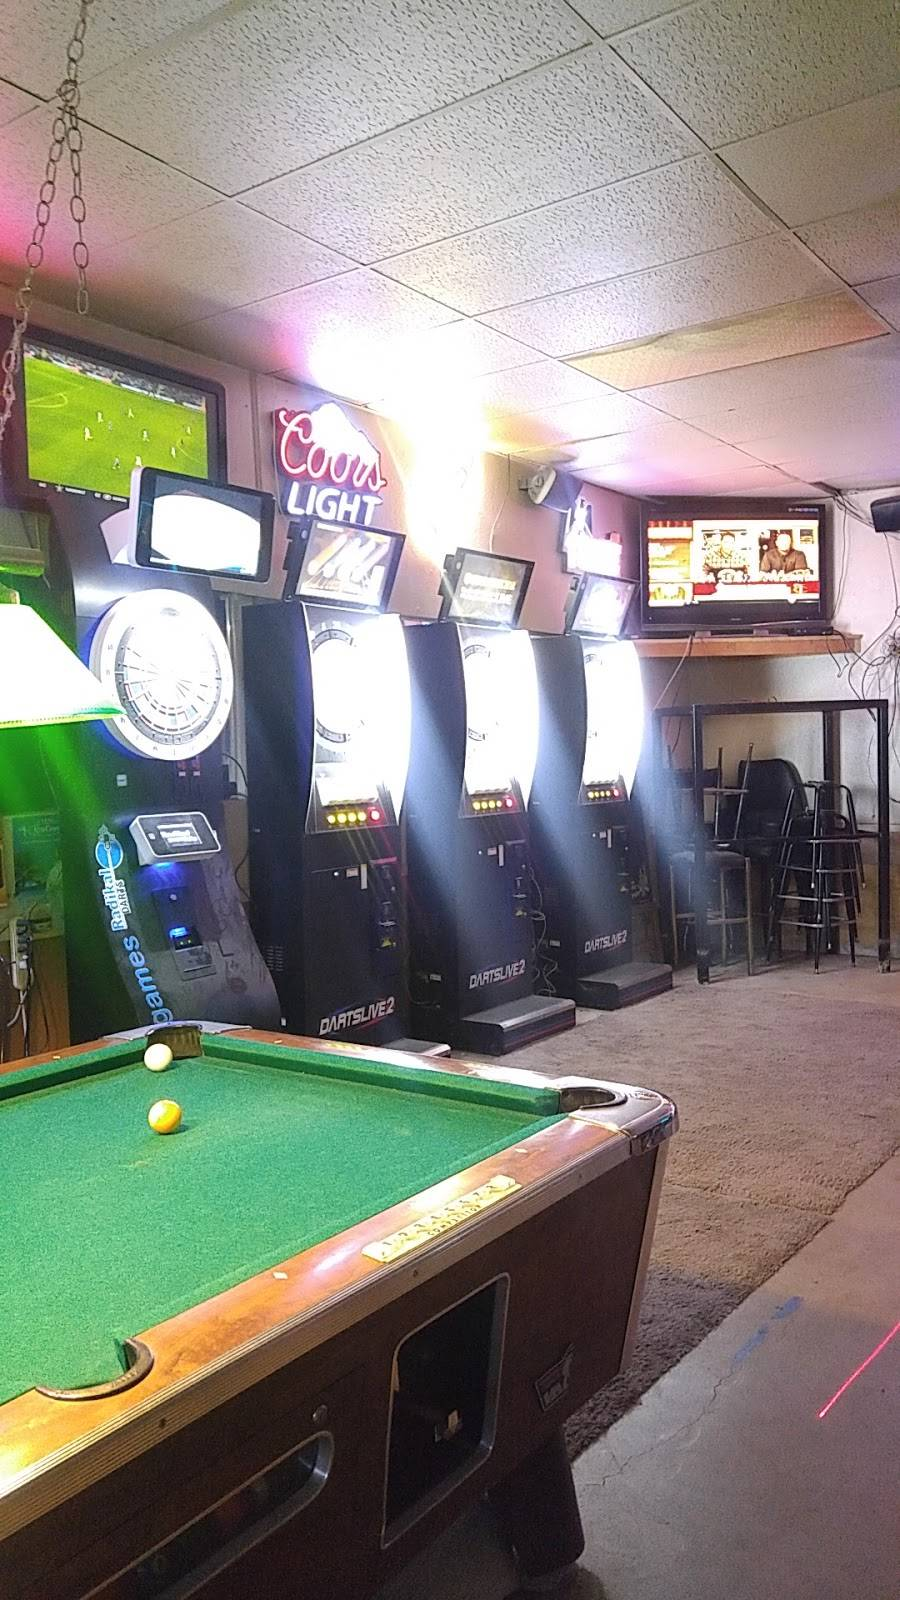 Rib Shop | restaurant | 4131 N 83rd Ave, Phoenix, AZ 85033, USA | 6238731188 OR +1 623-873-1188